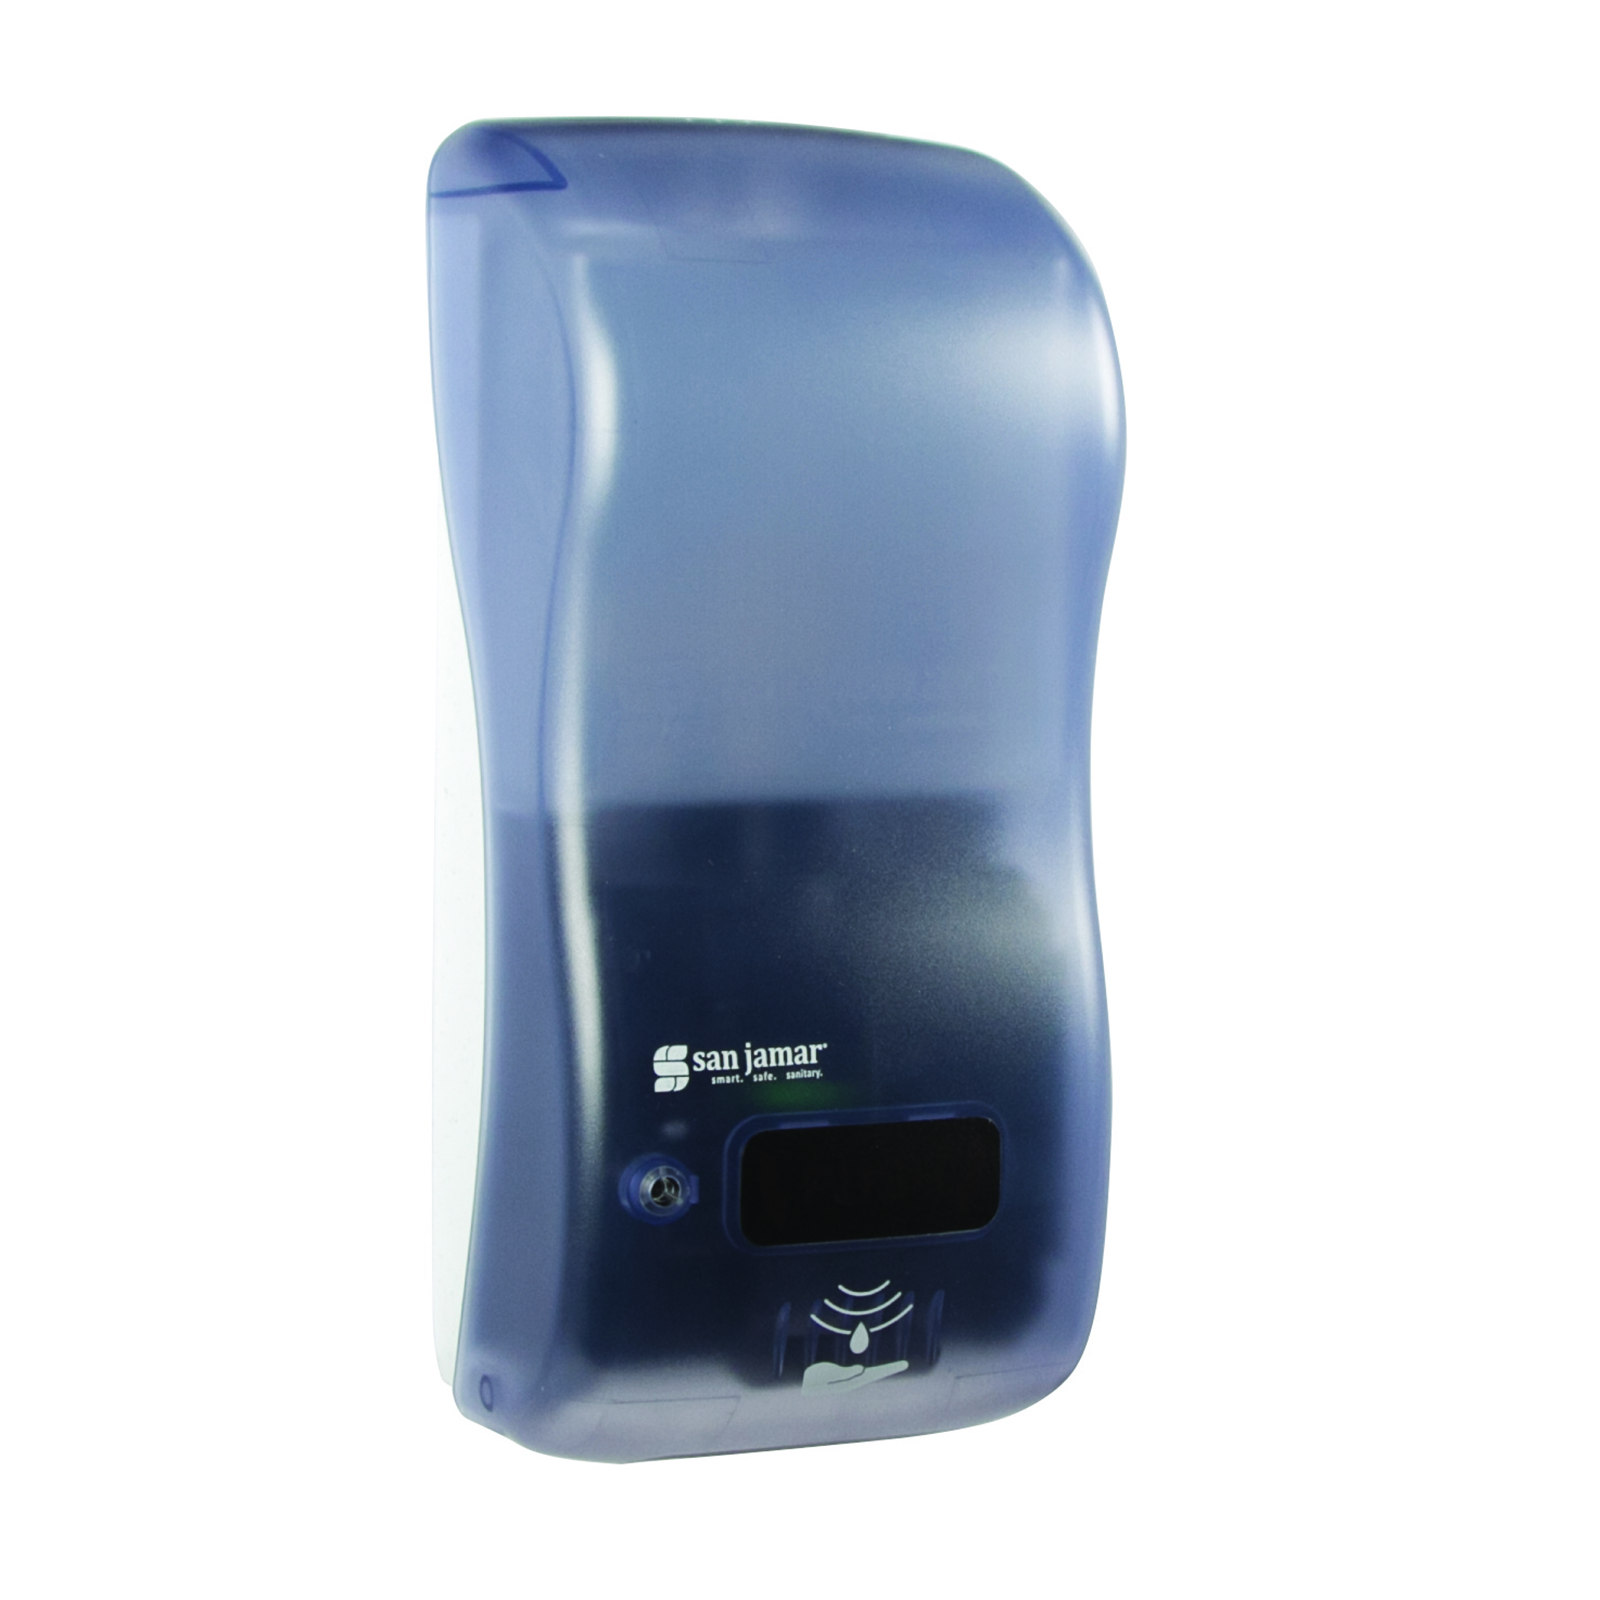 San Jamar SH900TBL hand soap / sanitizer dispenser